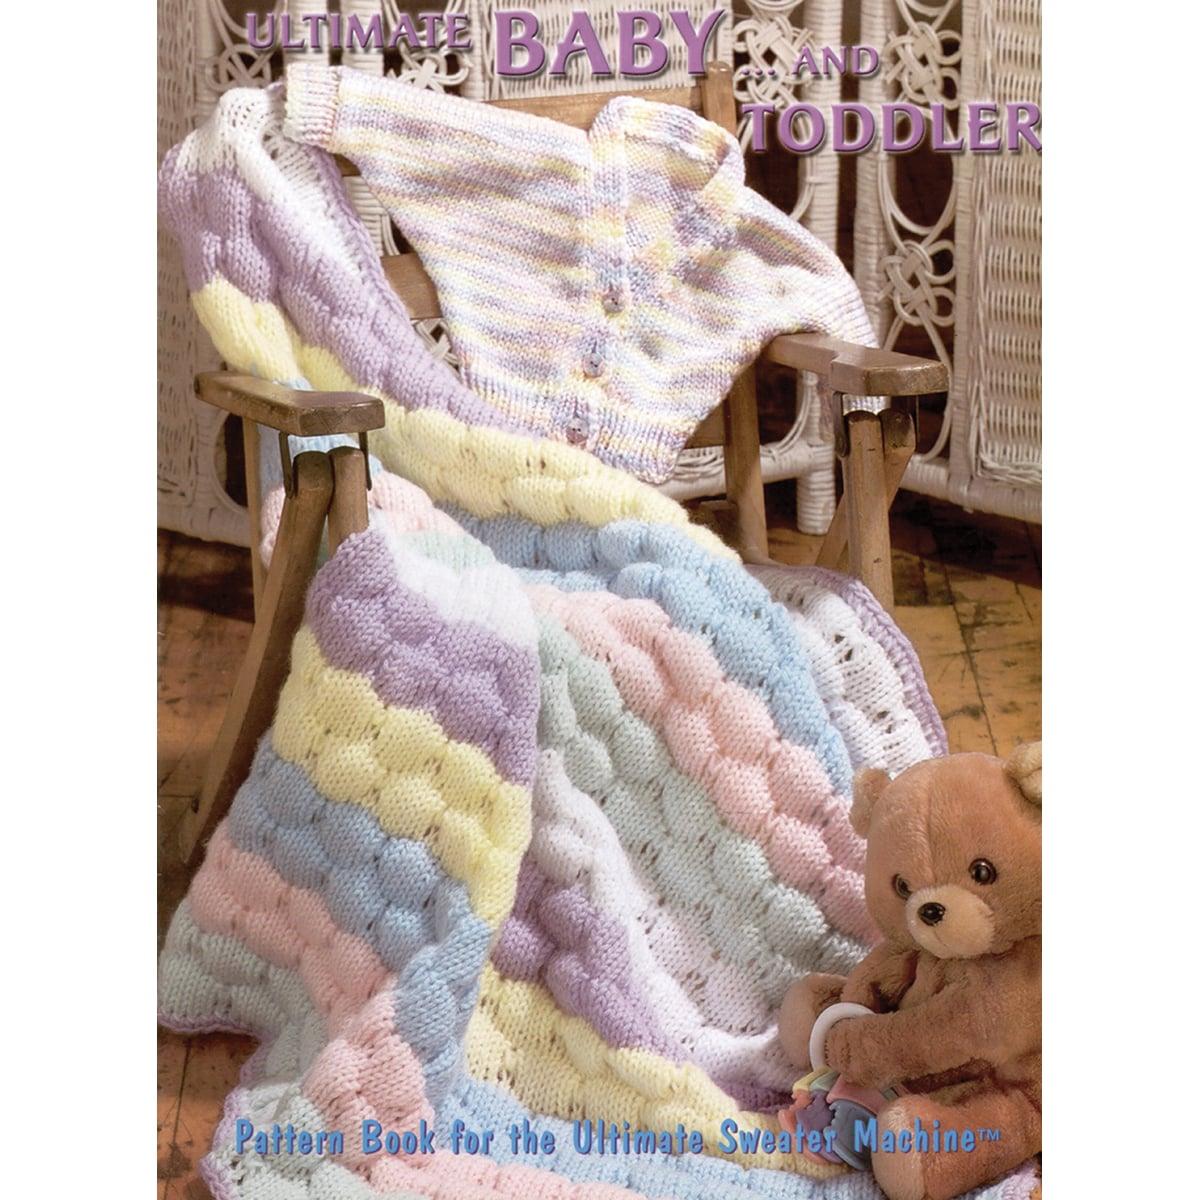 Bond America Books-Ultimate Baby & Toddler